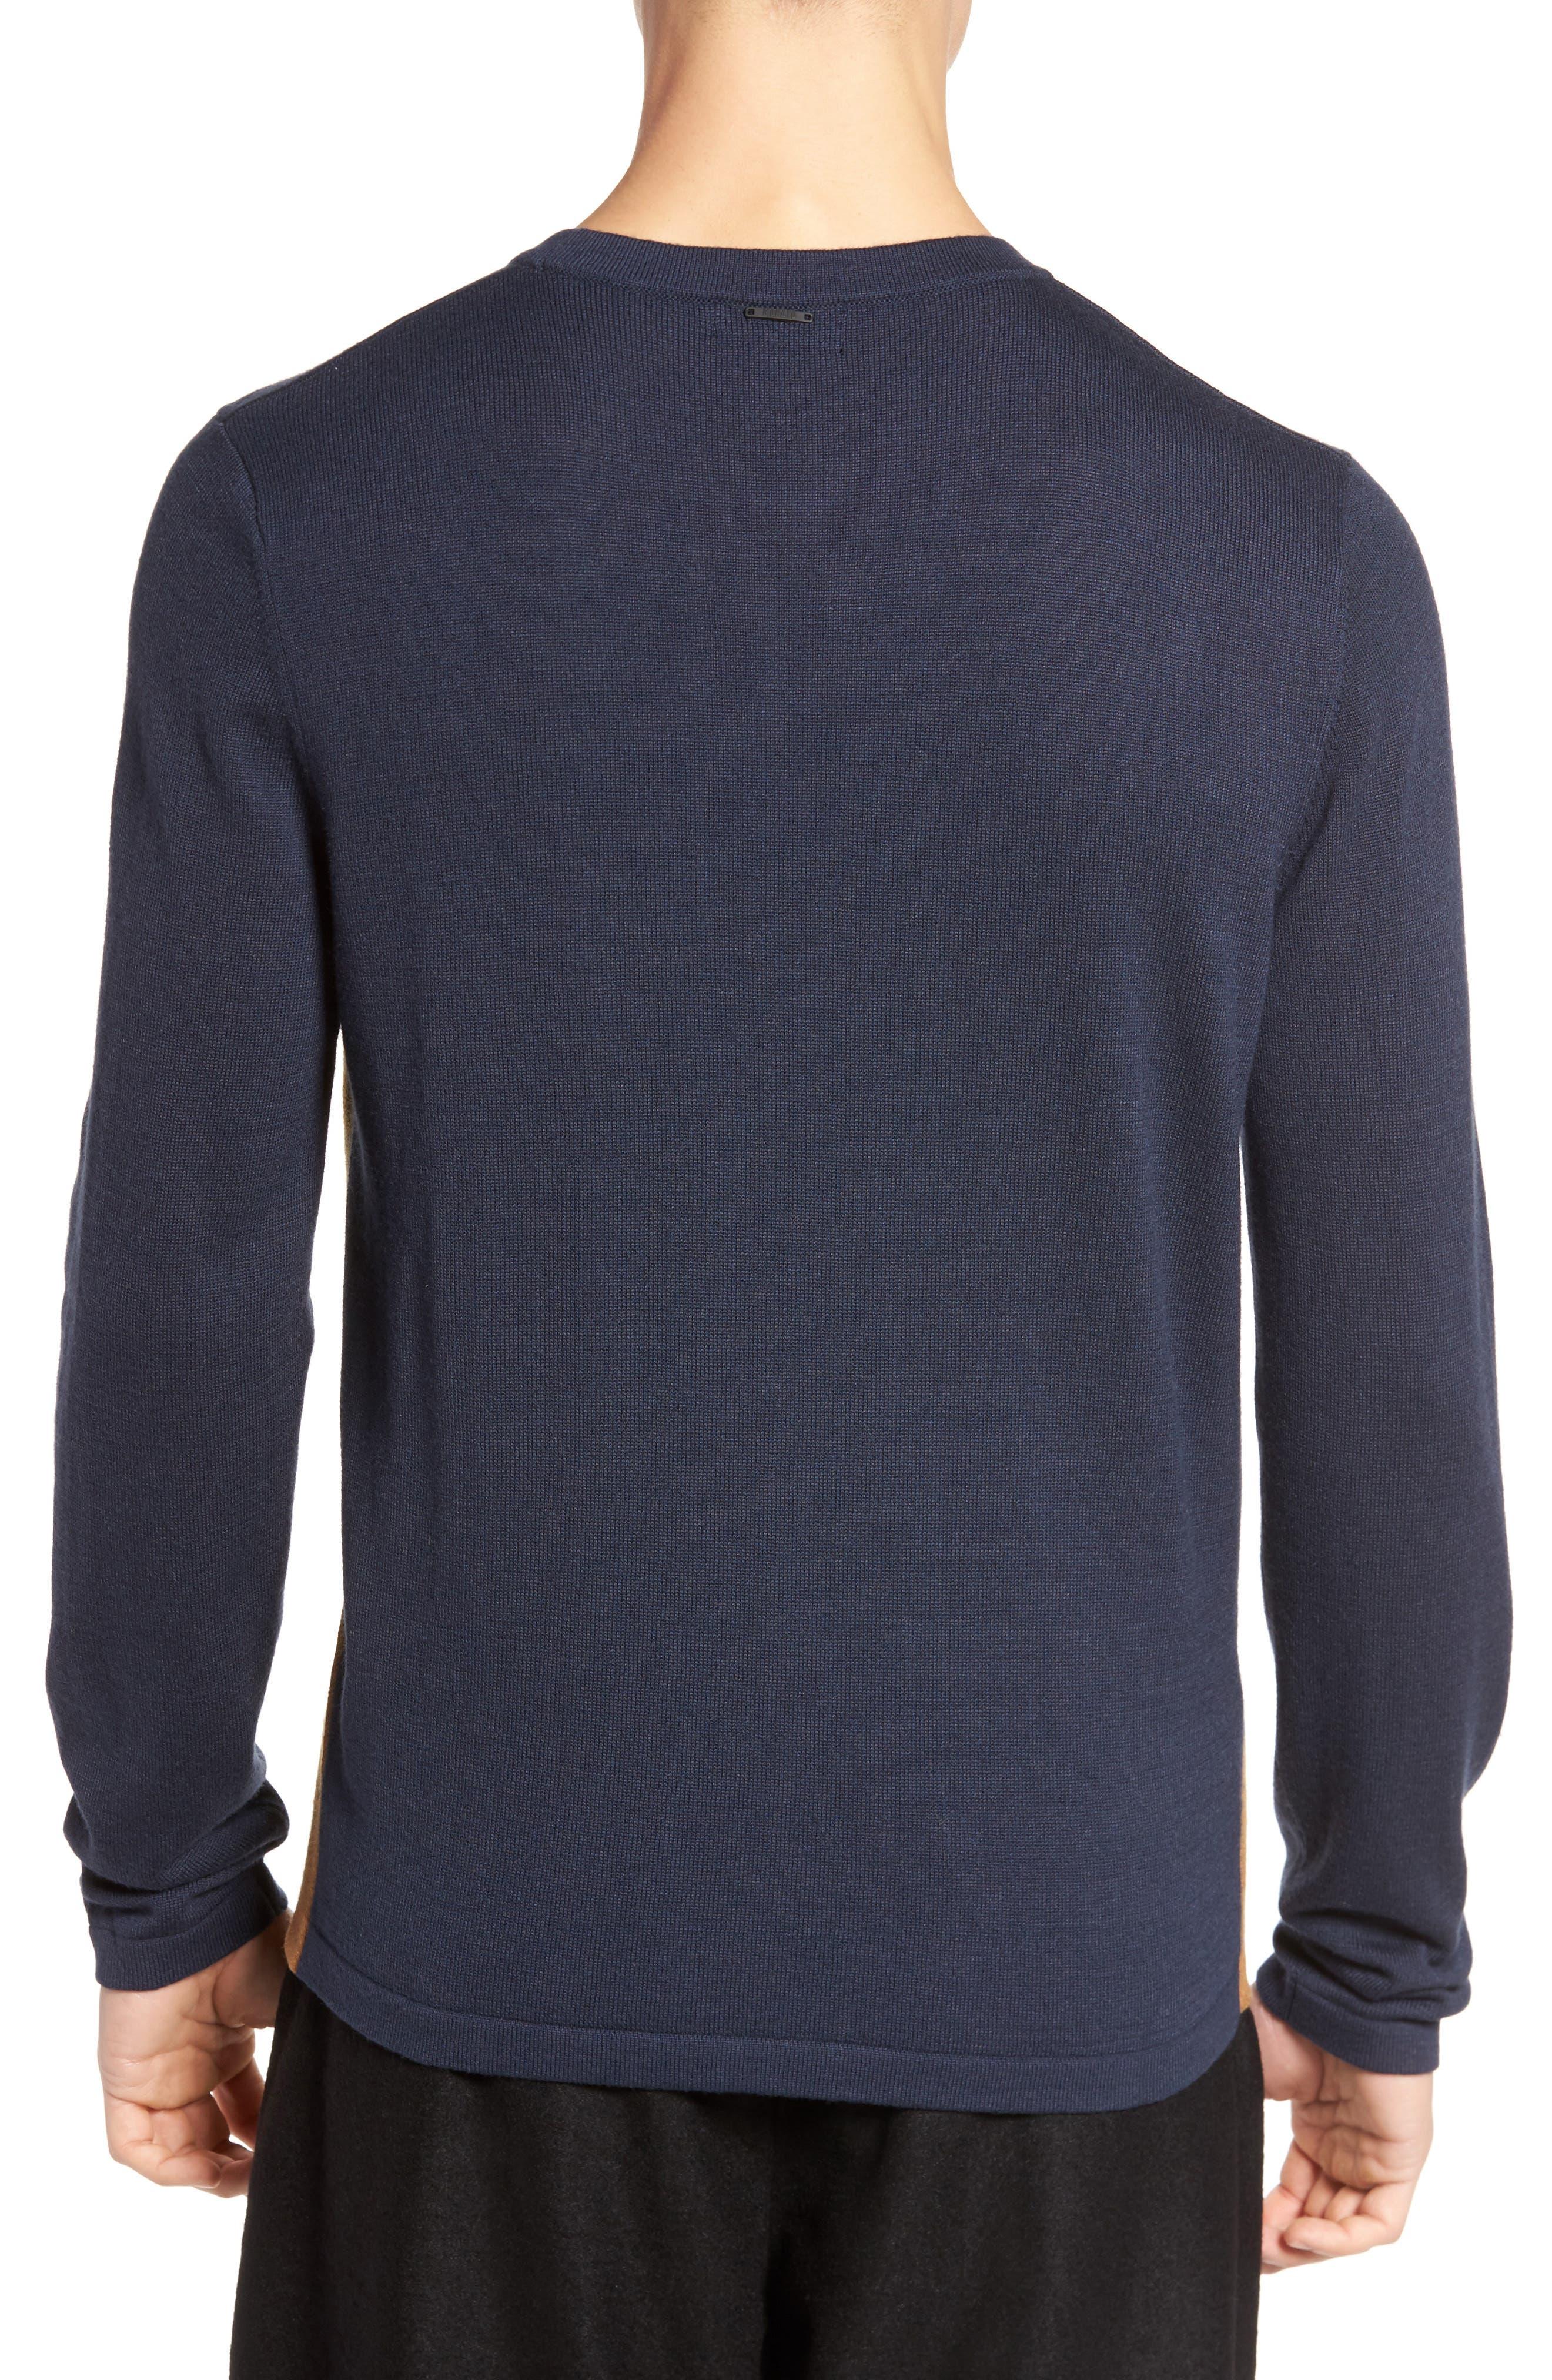 Anotny Morato Pattern Sweater,                             Alternate thumbnail 2, color,                             Soft Blue